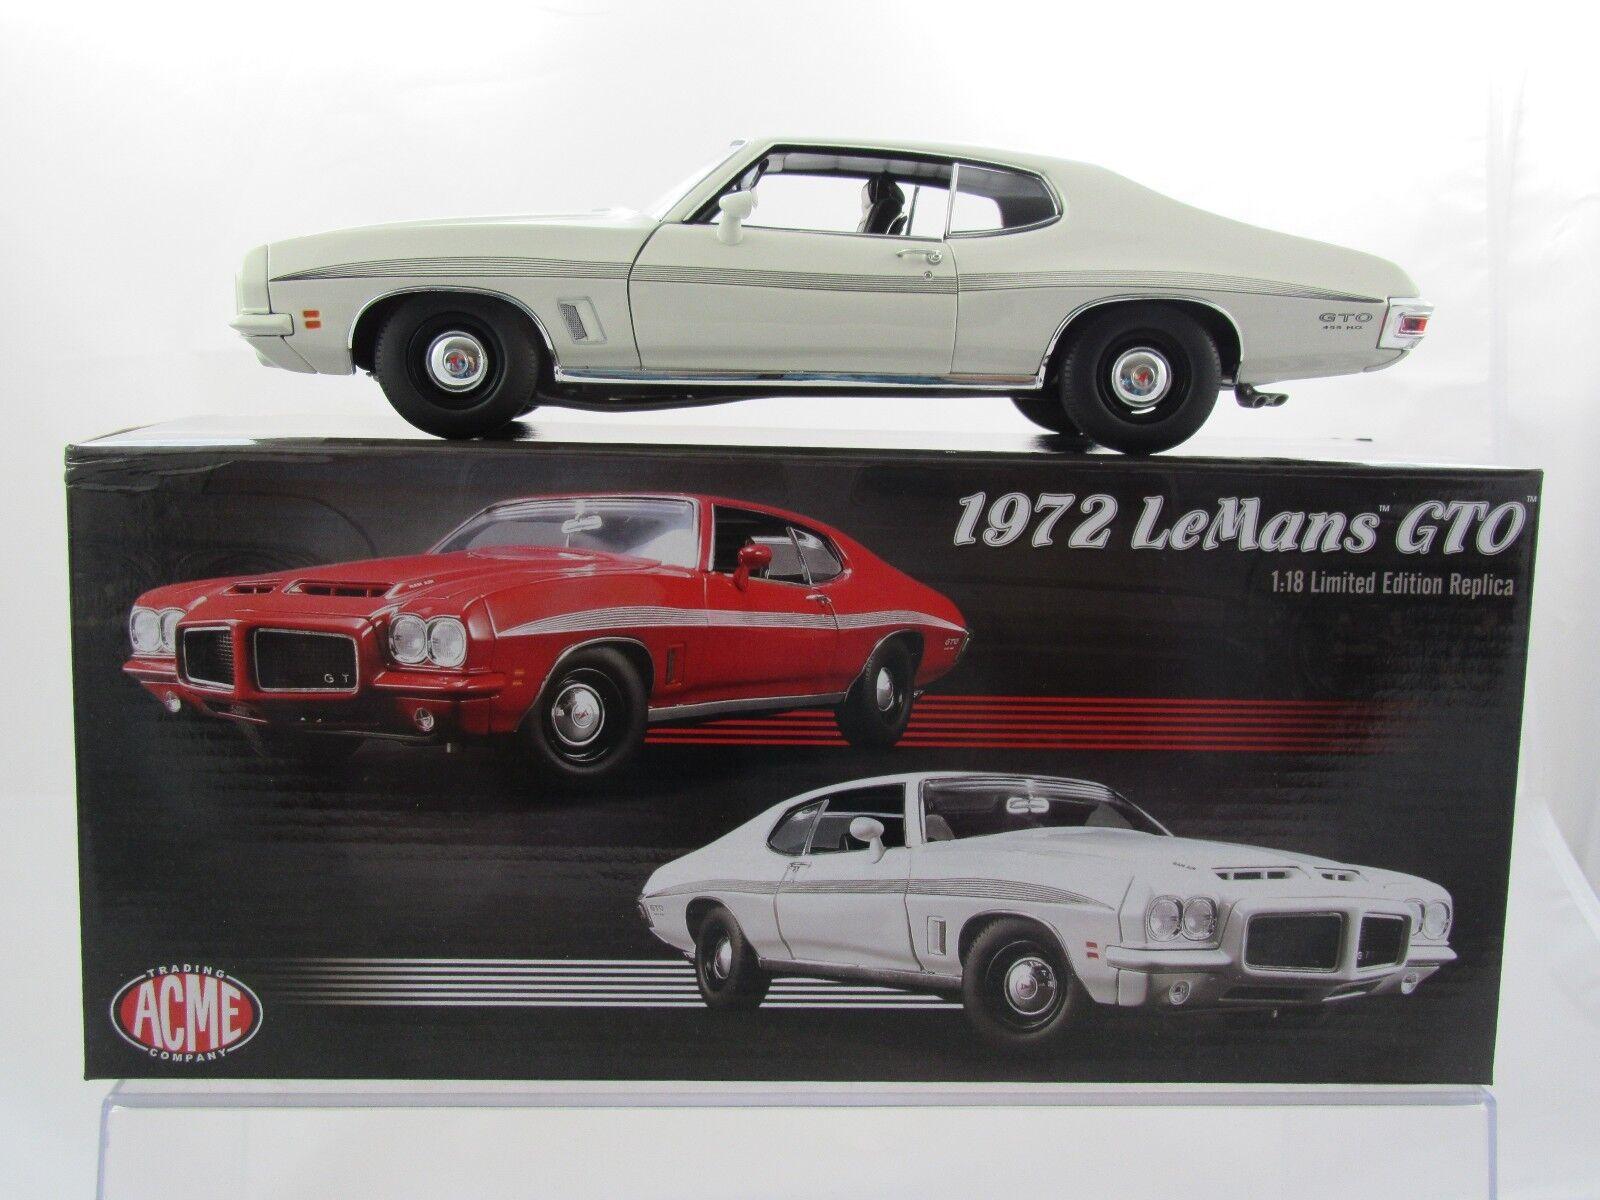 Acme 1972 Pontiac LeMans GTO in bianca A1801211